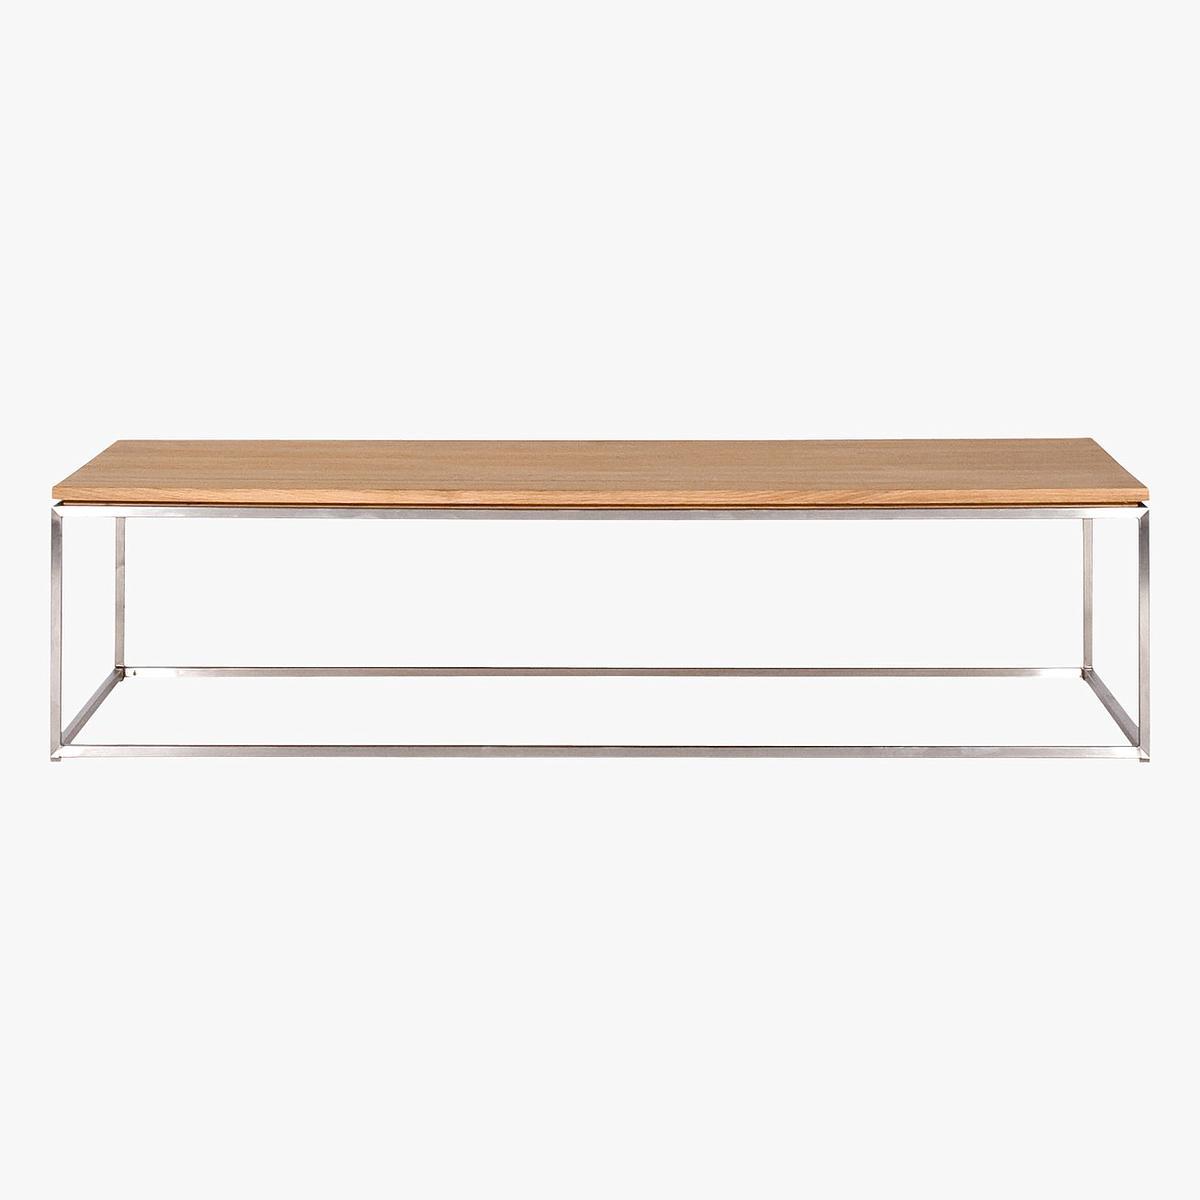 Table basse THIN Ethnicraft 120x70 chêne